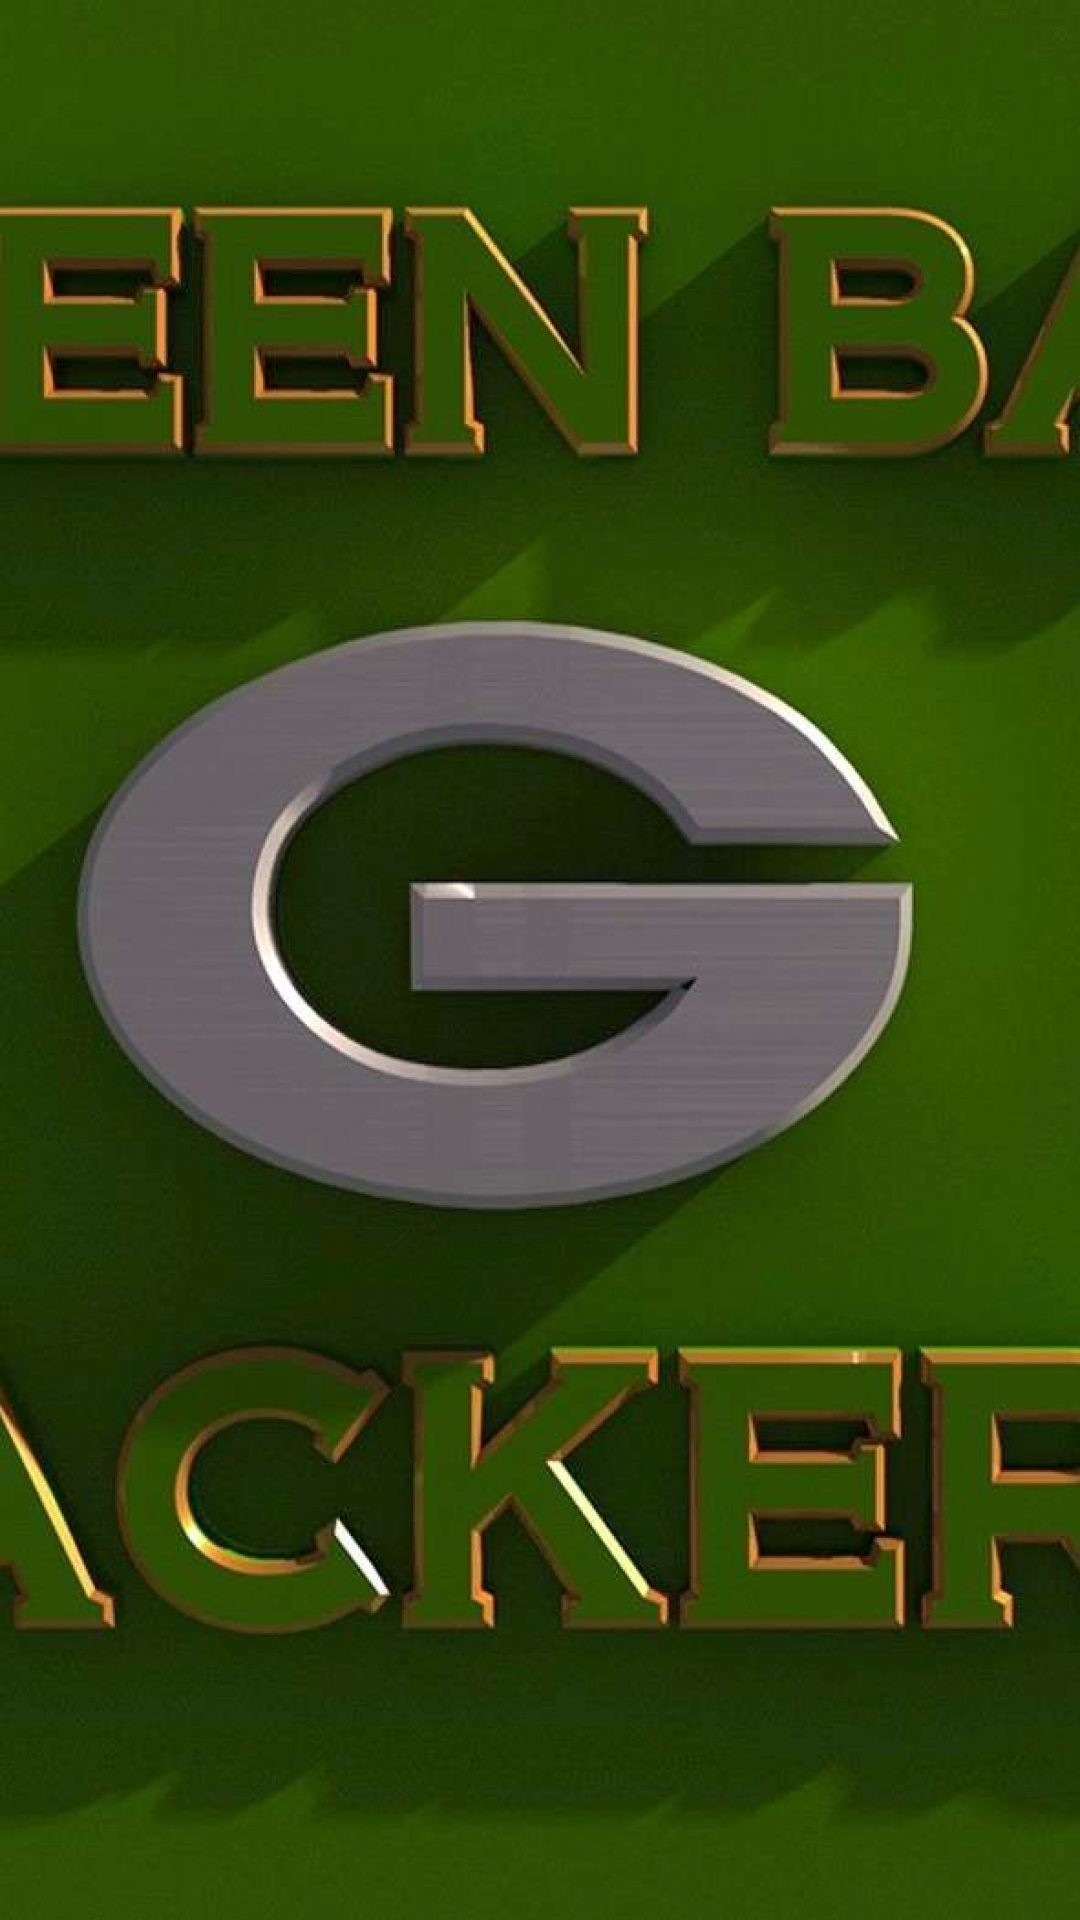 free green bay packer wallpaper